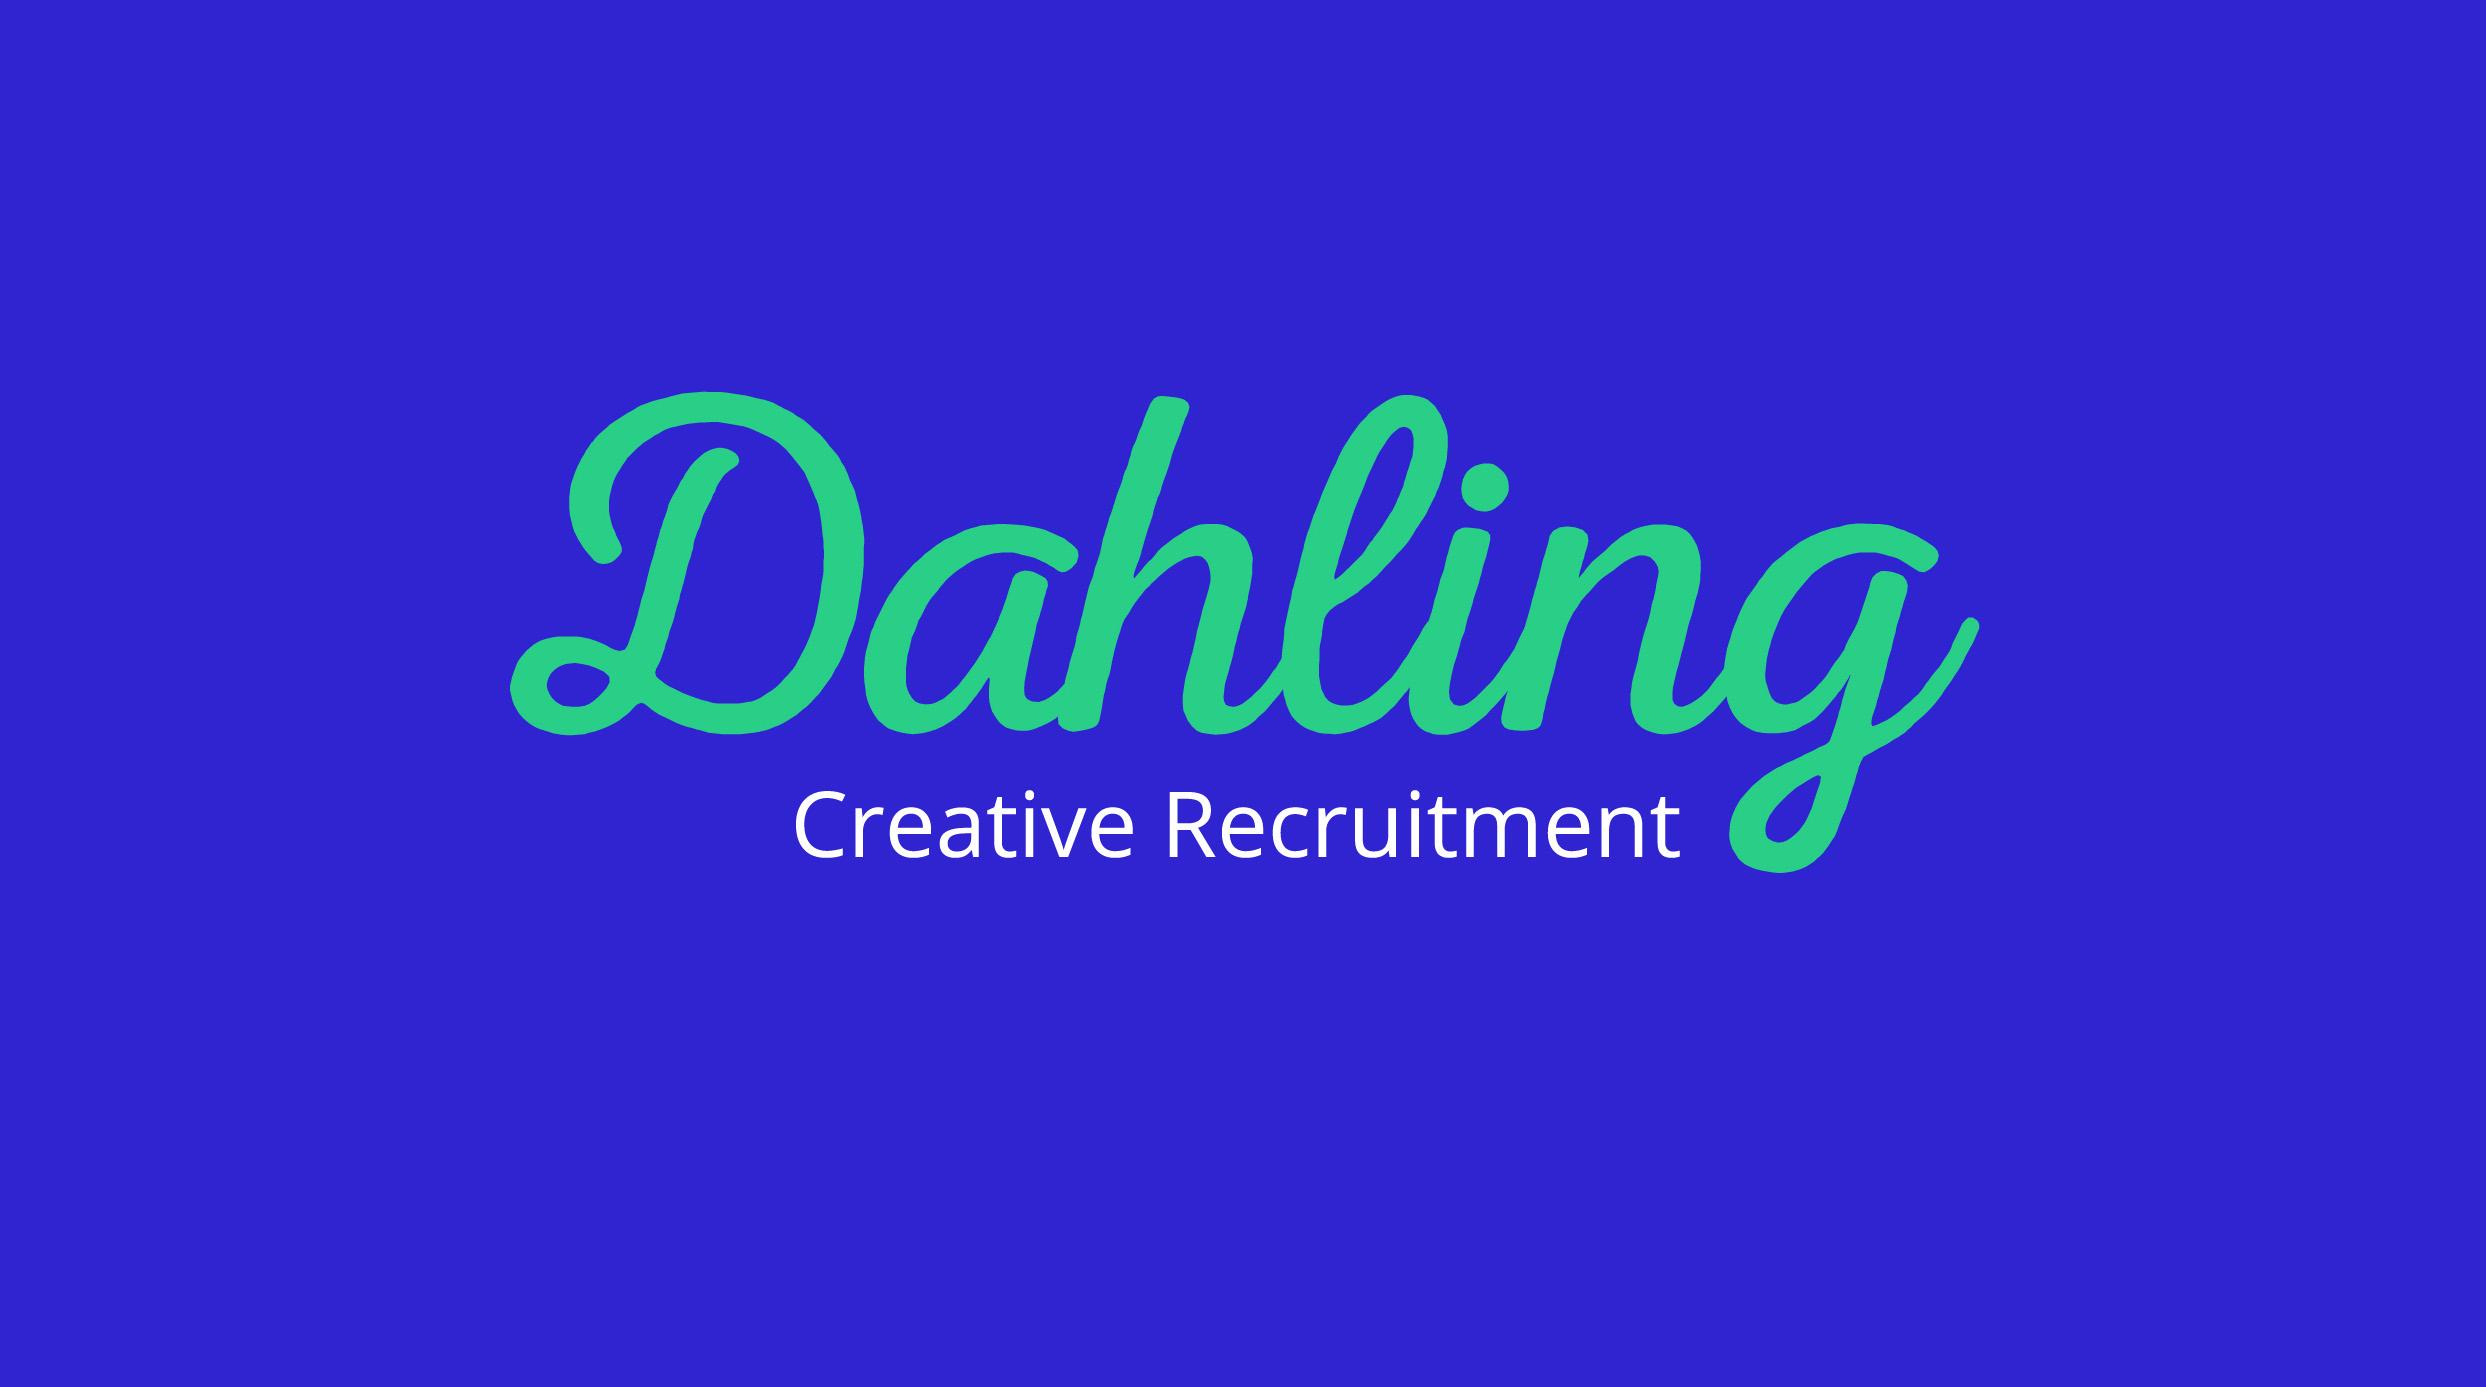 LMPP Dahling Recruitment Logo master.jpg